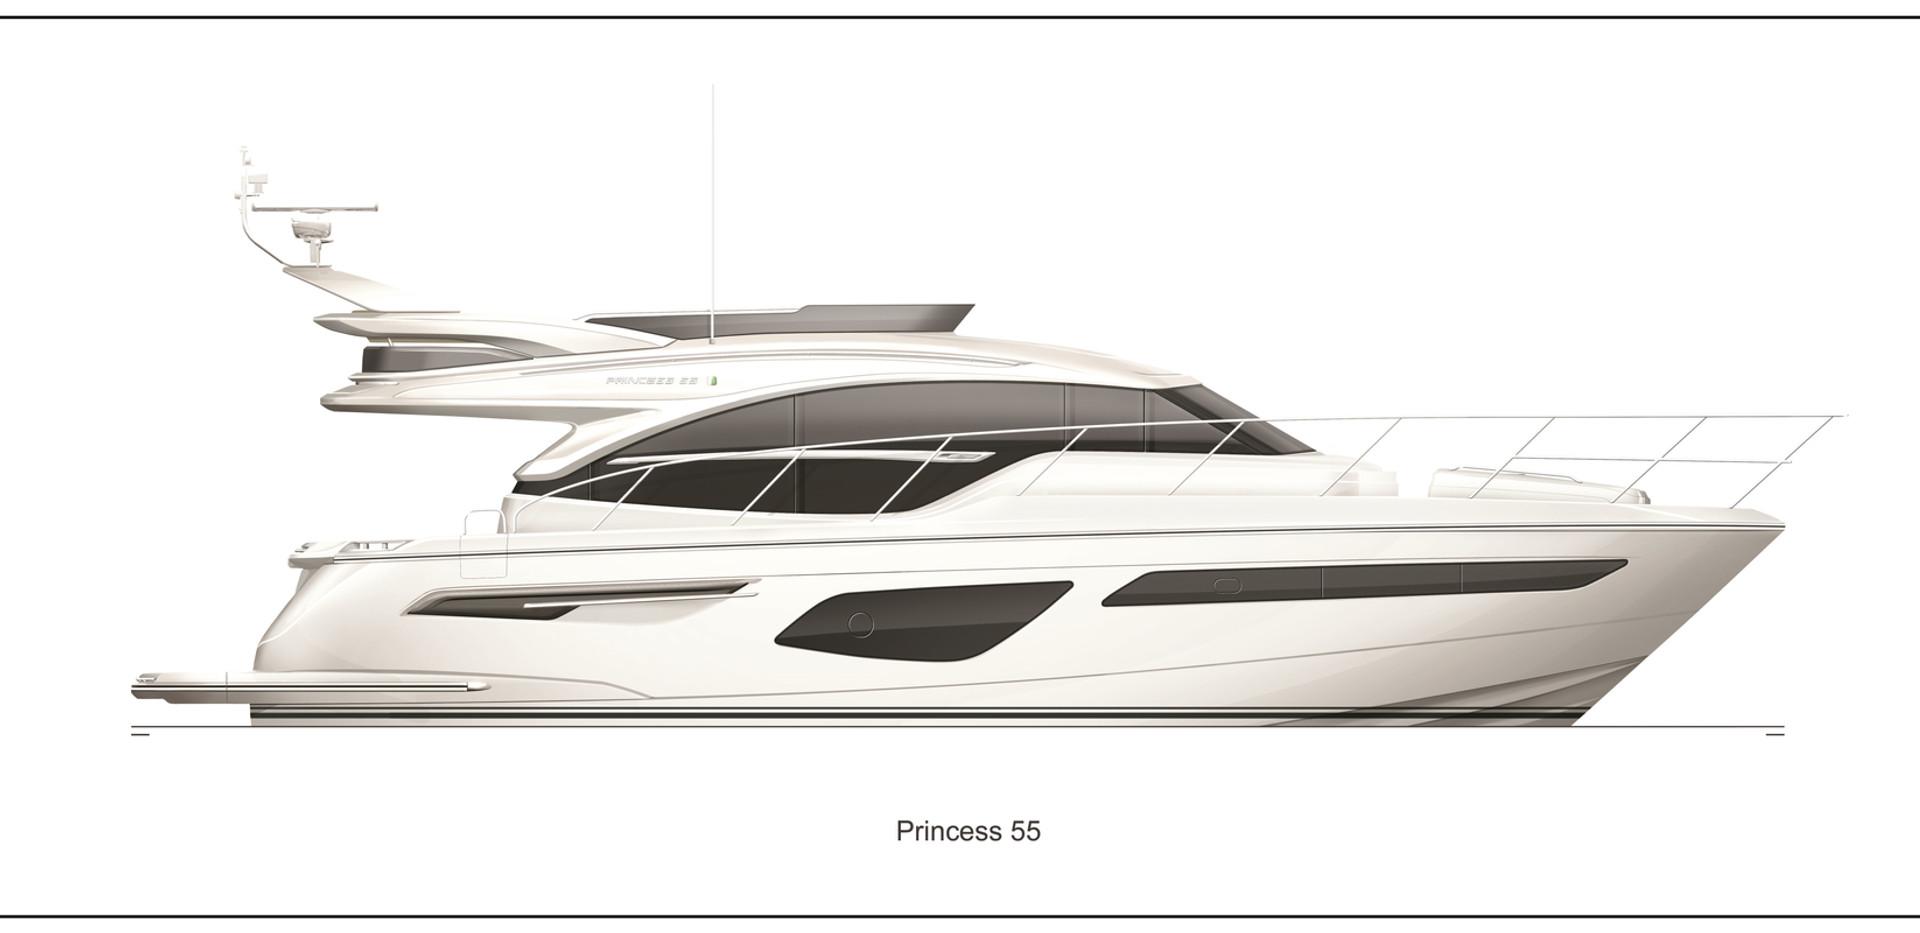 55-profile-white-hull.jpg